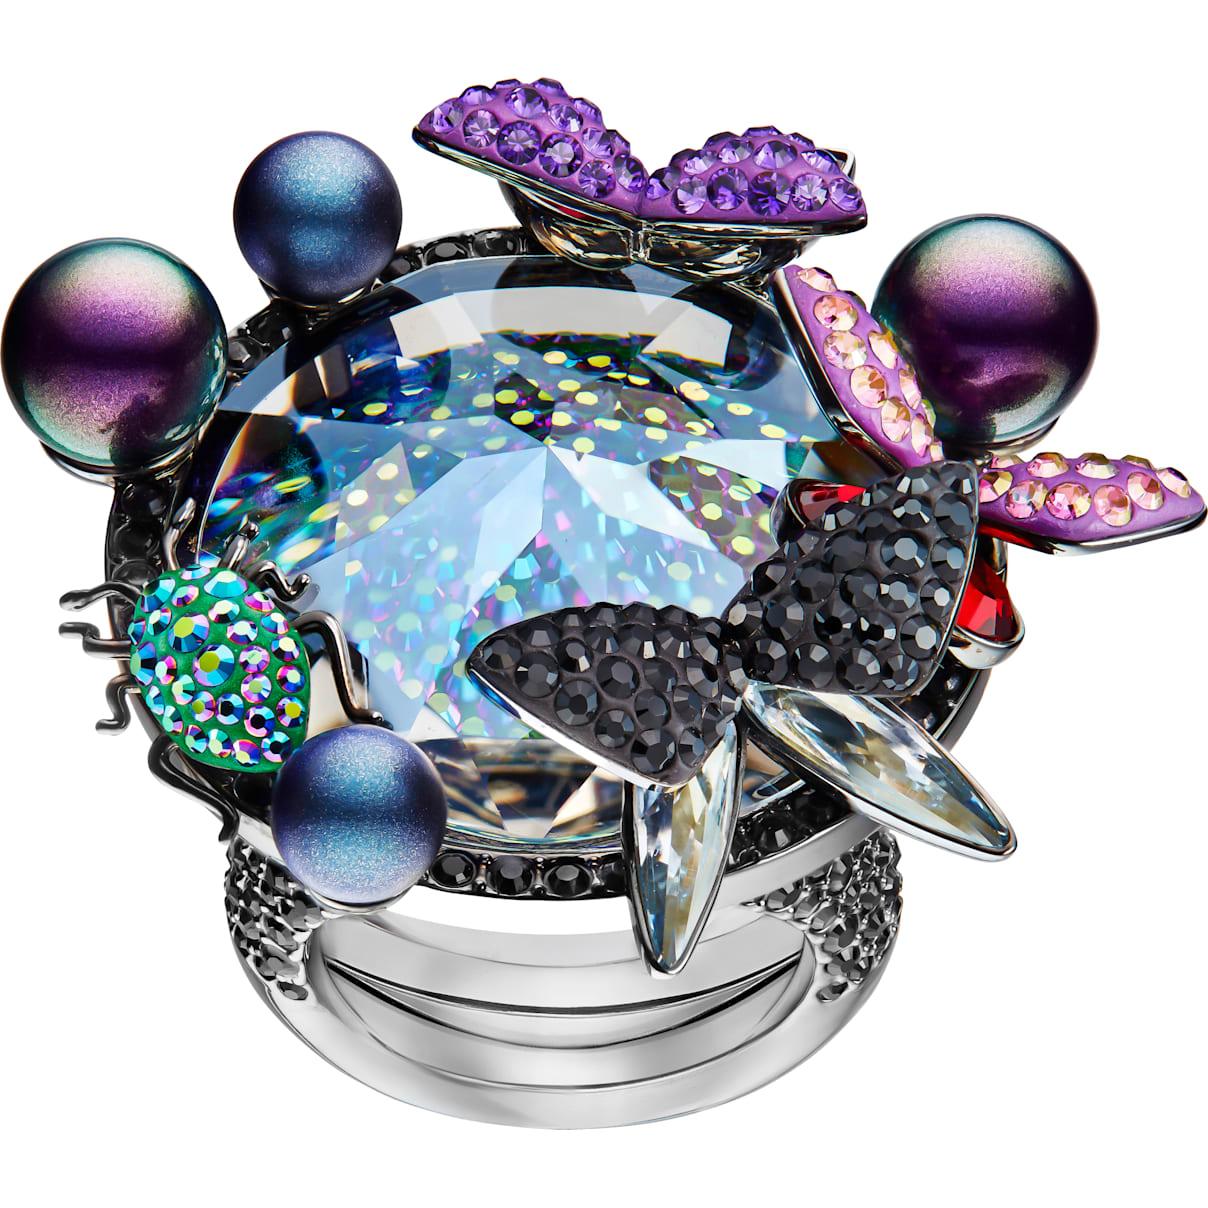 Swarovski Magnetized Cocktail Ring, Multi-colored, Black Ruthenium plated